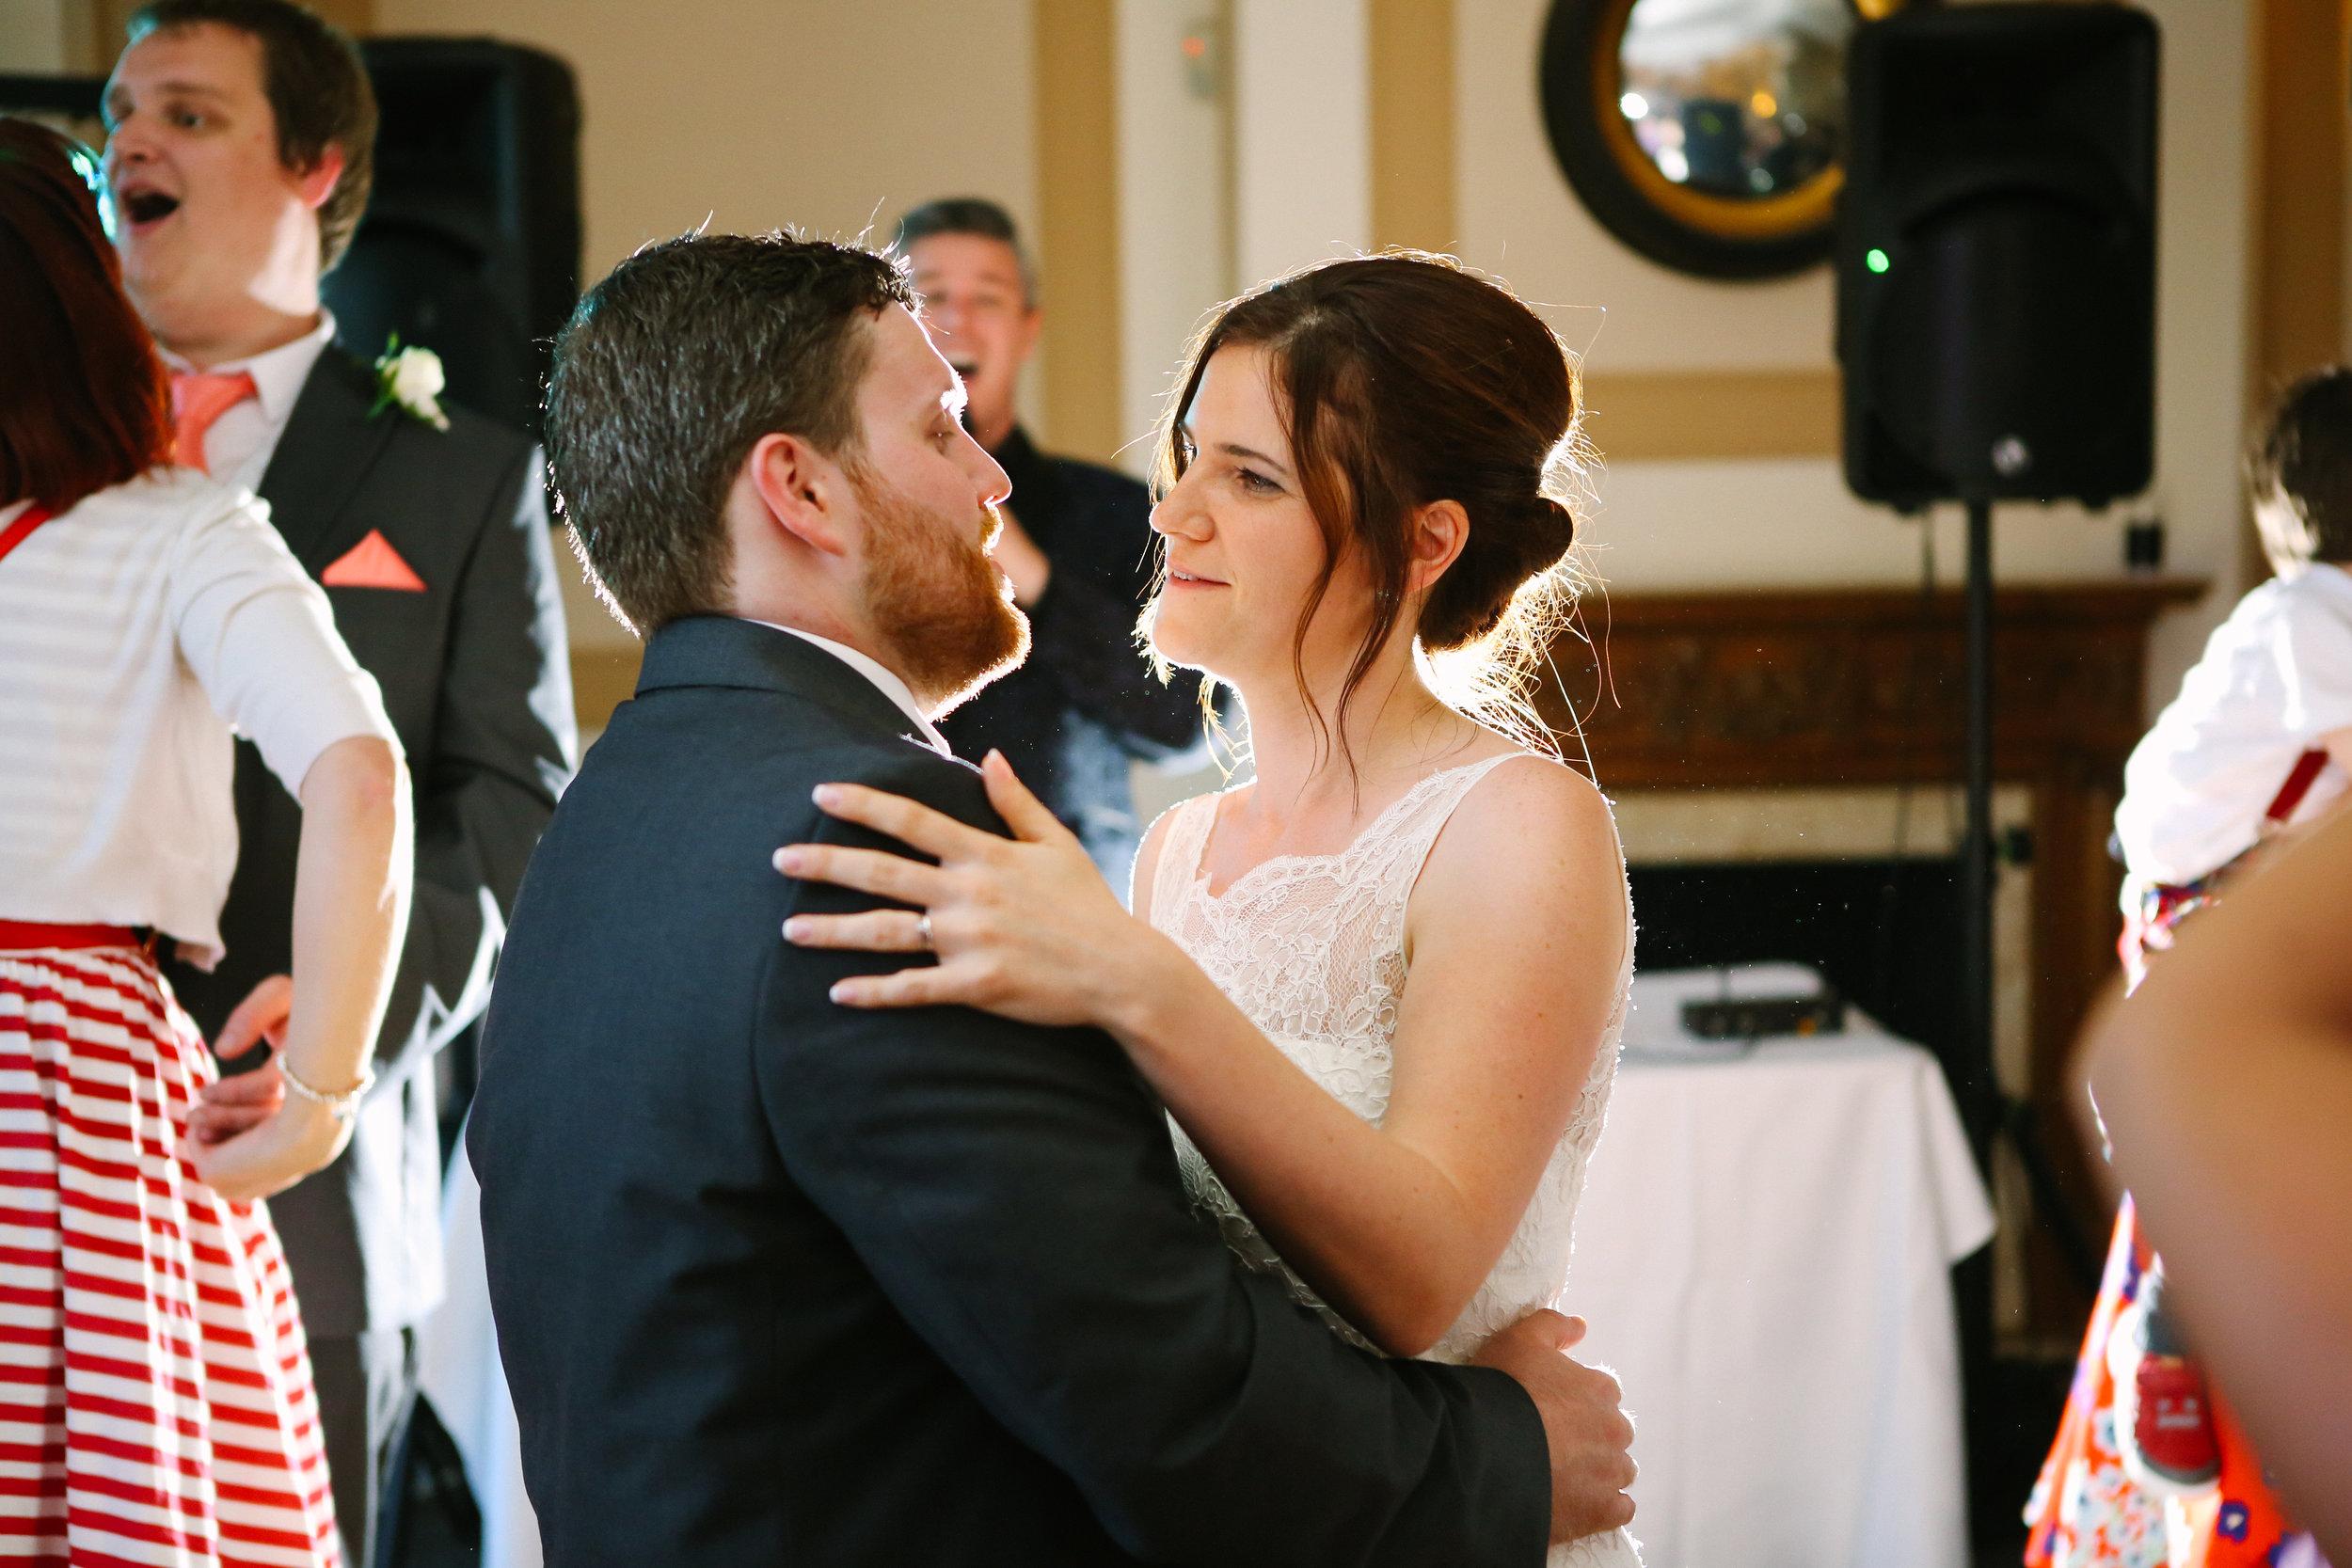 reigate-surrey-london-wedding-photography-group-formal-shot-reception-woldingham-golf-club-110